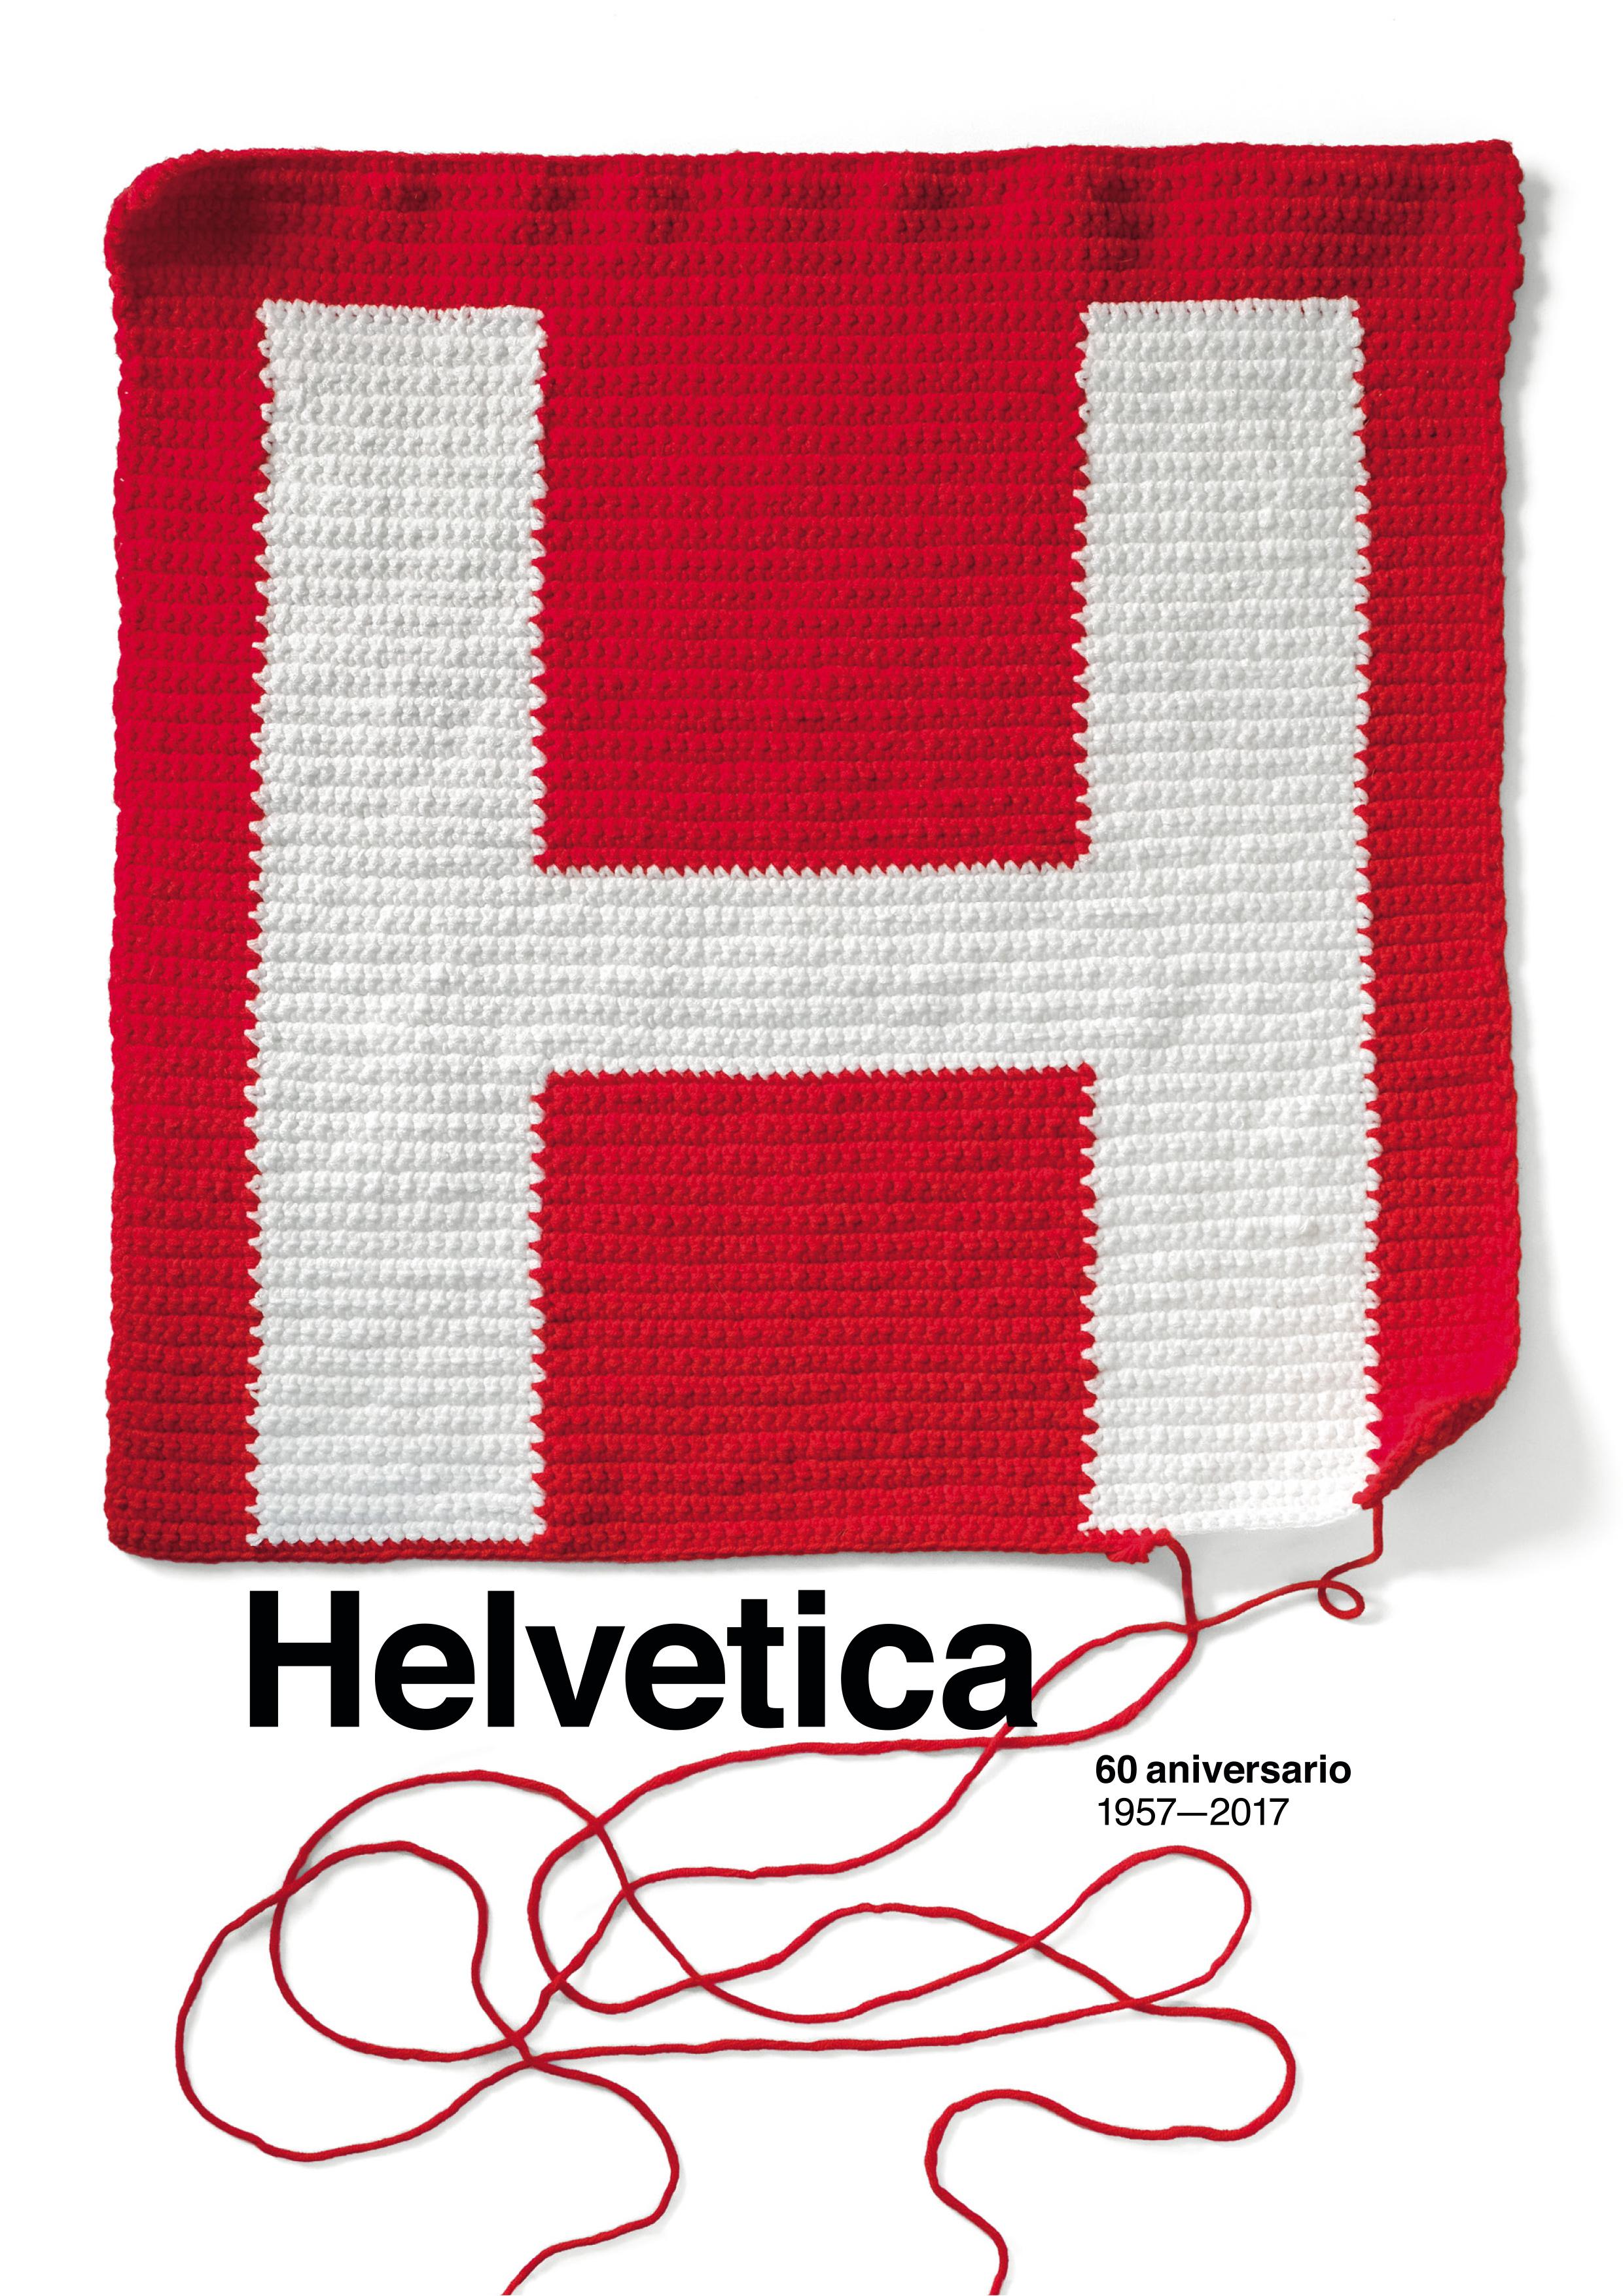 60th Anniversary Helvetica Typeface by Estudio Pep Carrió - Creative Work